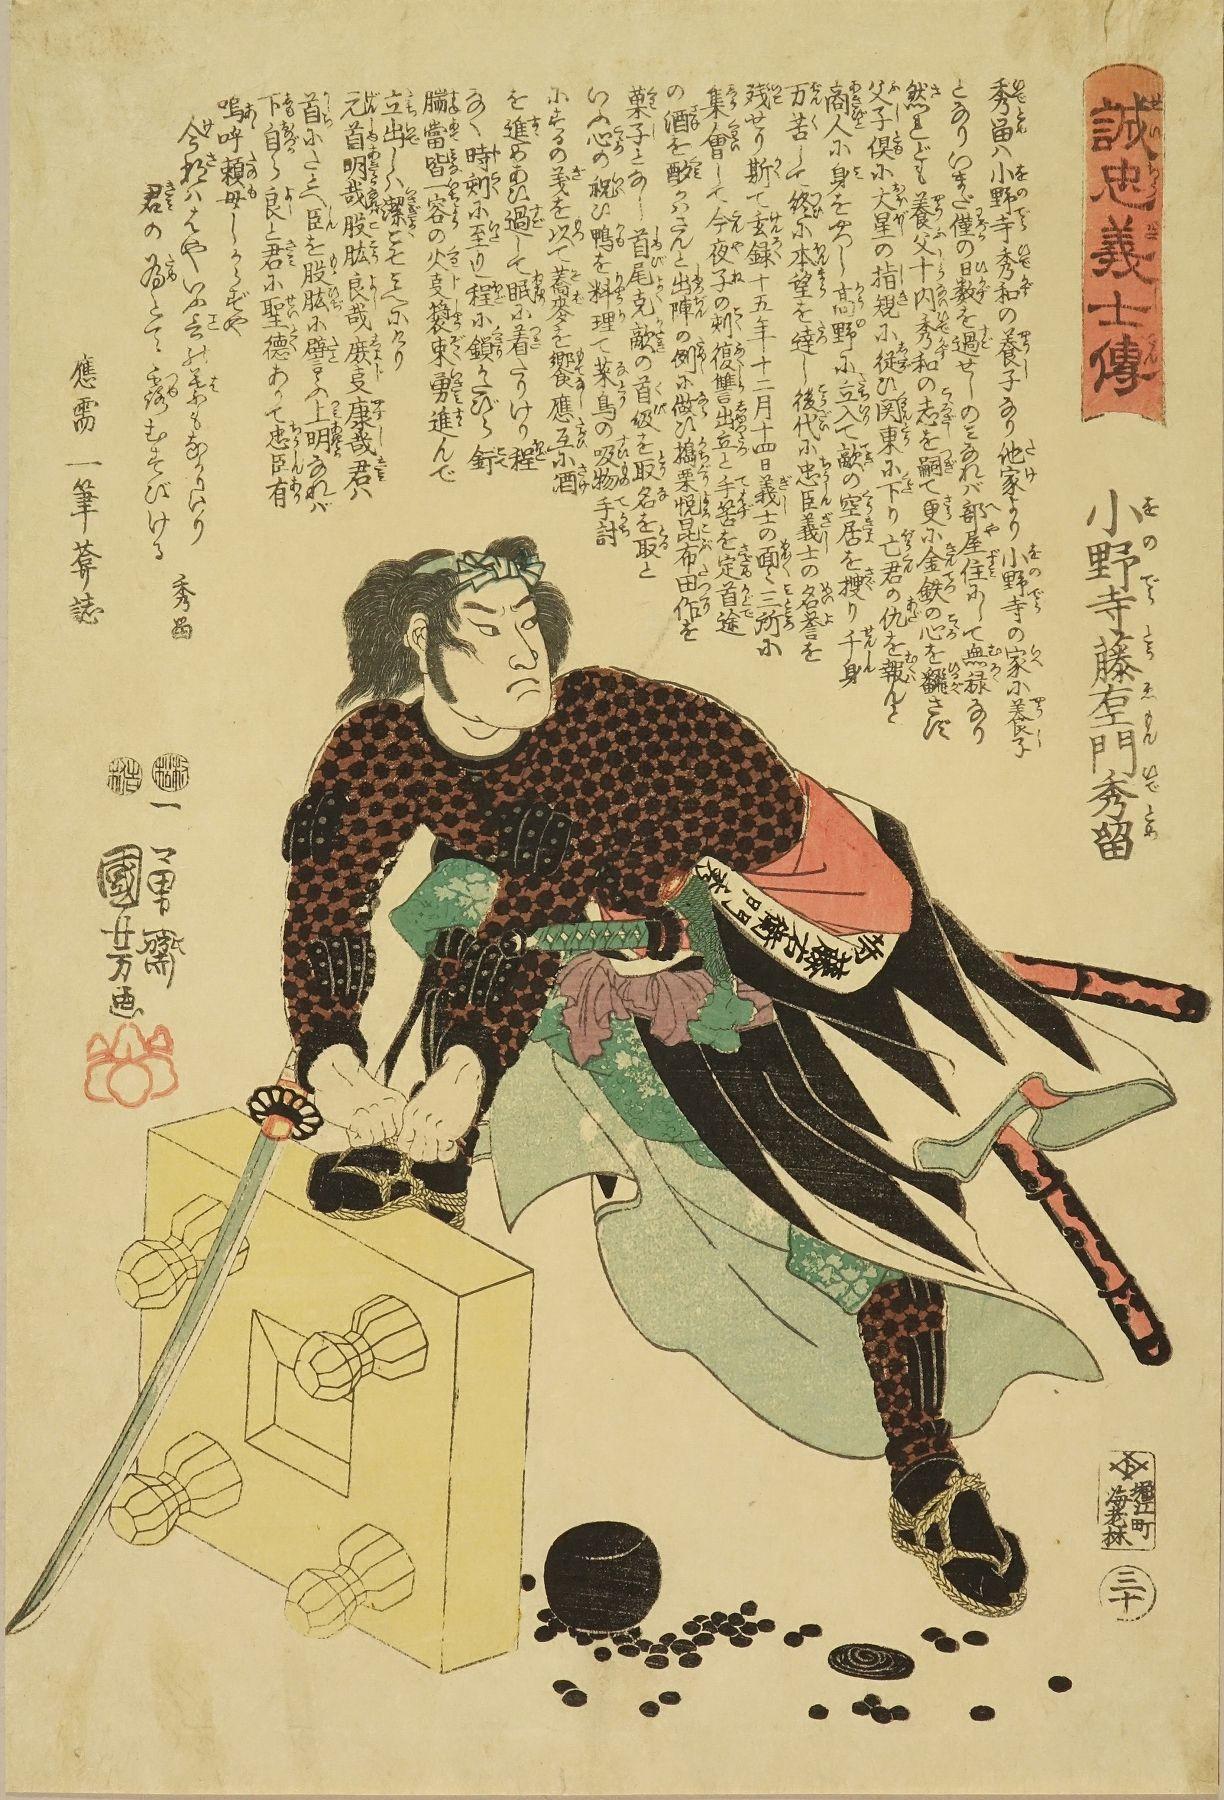 KUNIYOSHI Onodera Toemon Hidetome (Onodera Koemon Hidetomi), from <i>Seichu gishiden</i> (Stories of the true loyalty of the faithful samurai)